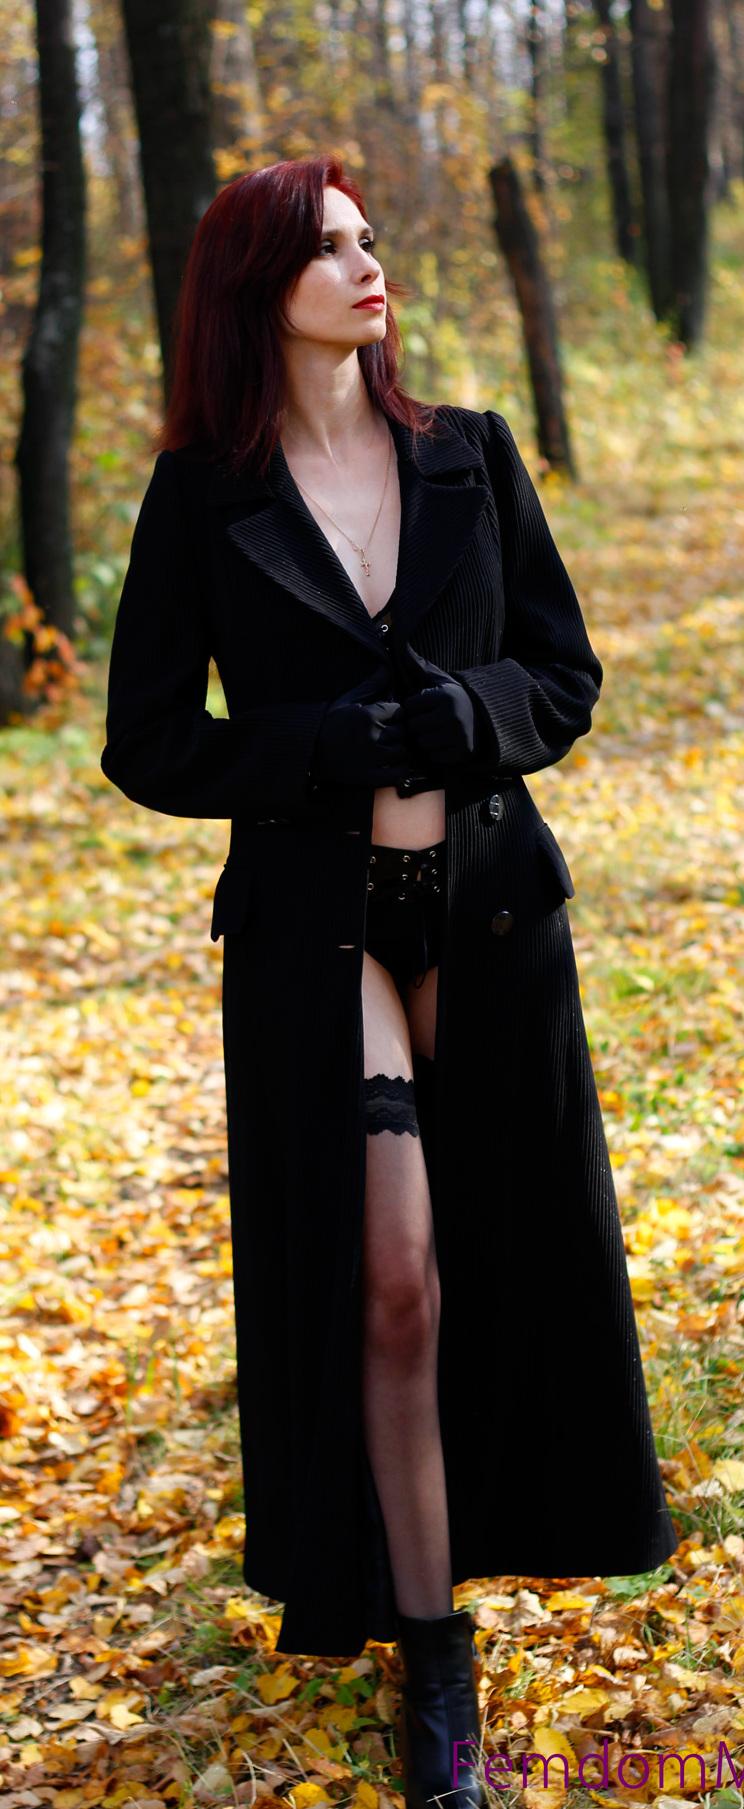 Госпожа Sasha Femdom Екатеринбург